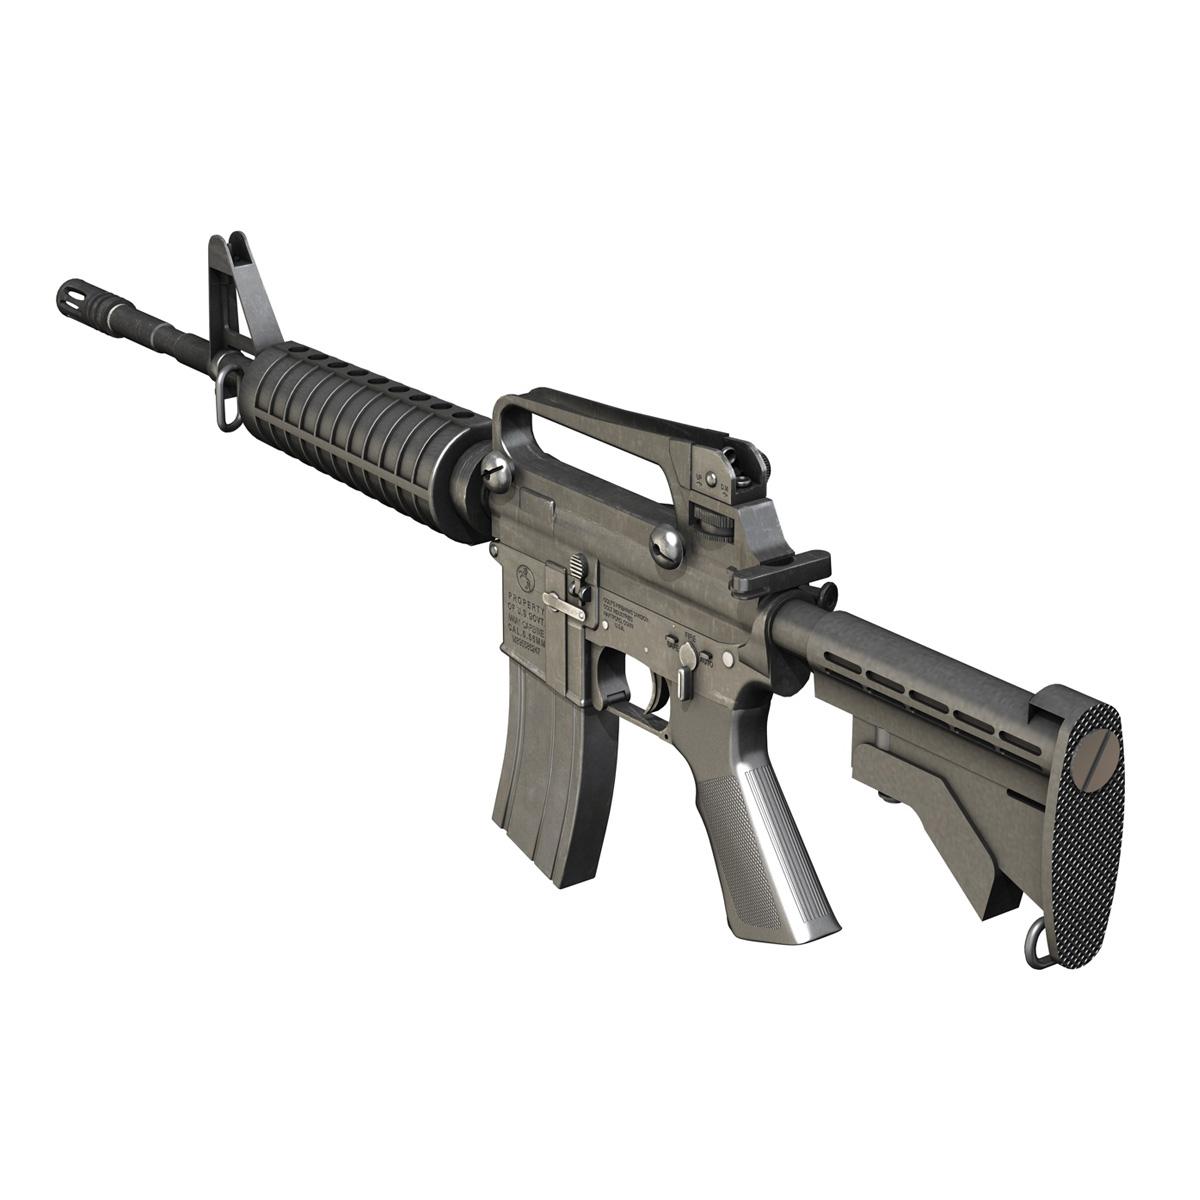 colt m4a1 carbine довтолгооны буу 3d загвар 3ds fbx c4d lwo obj 187788